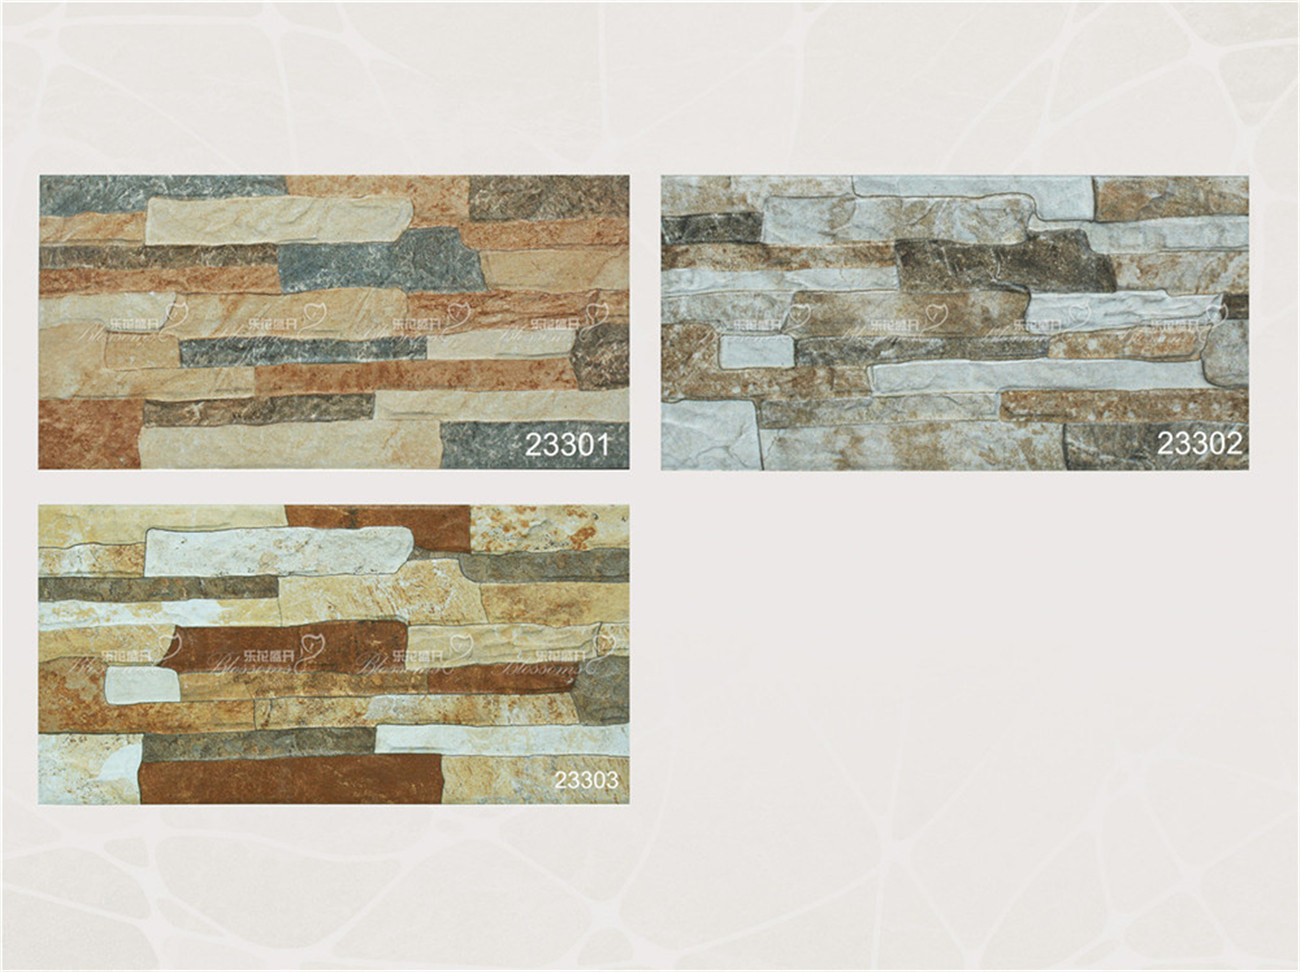 rustikale nat rliche cutural stein wand keramikziegel. Black Bedroom Furniture Sets. Home Design Ideas